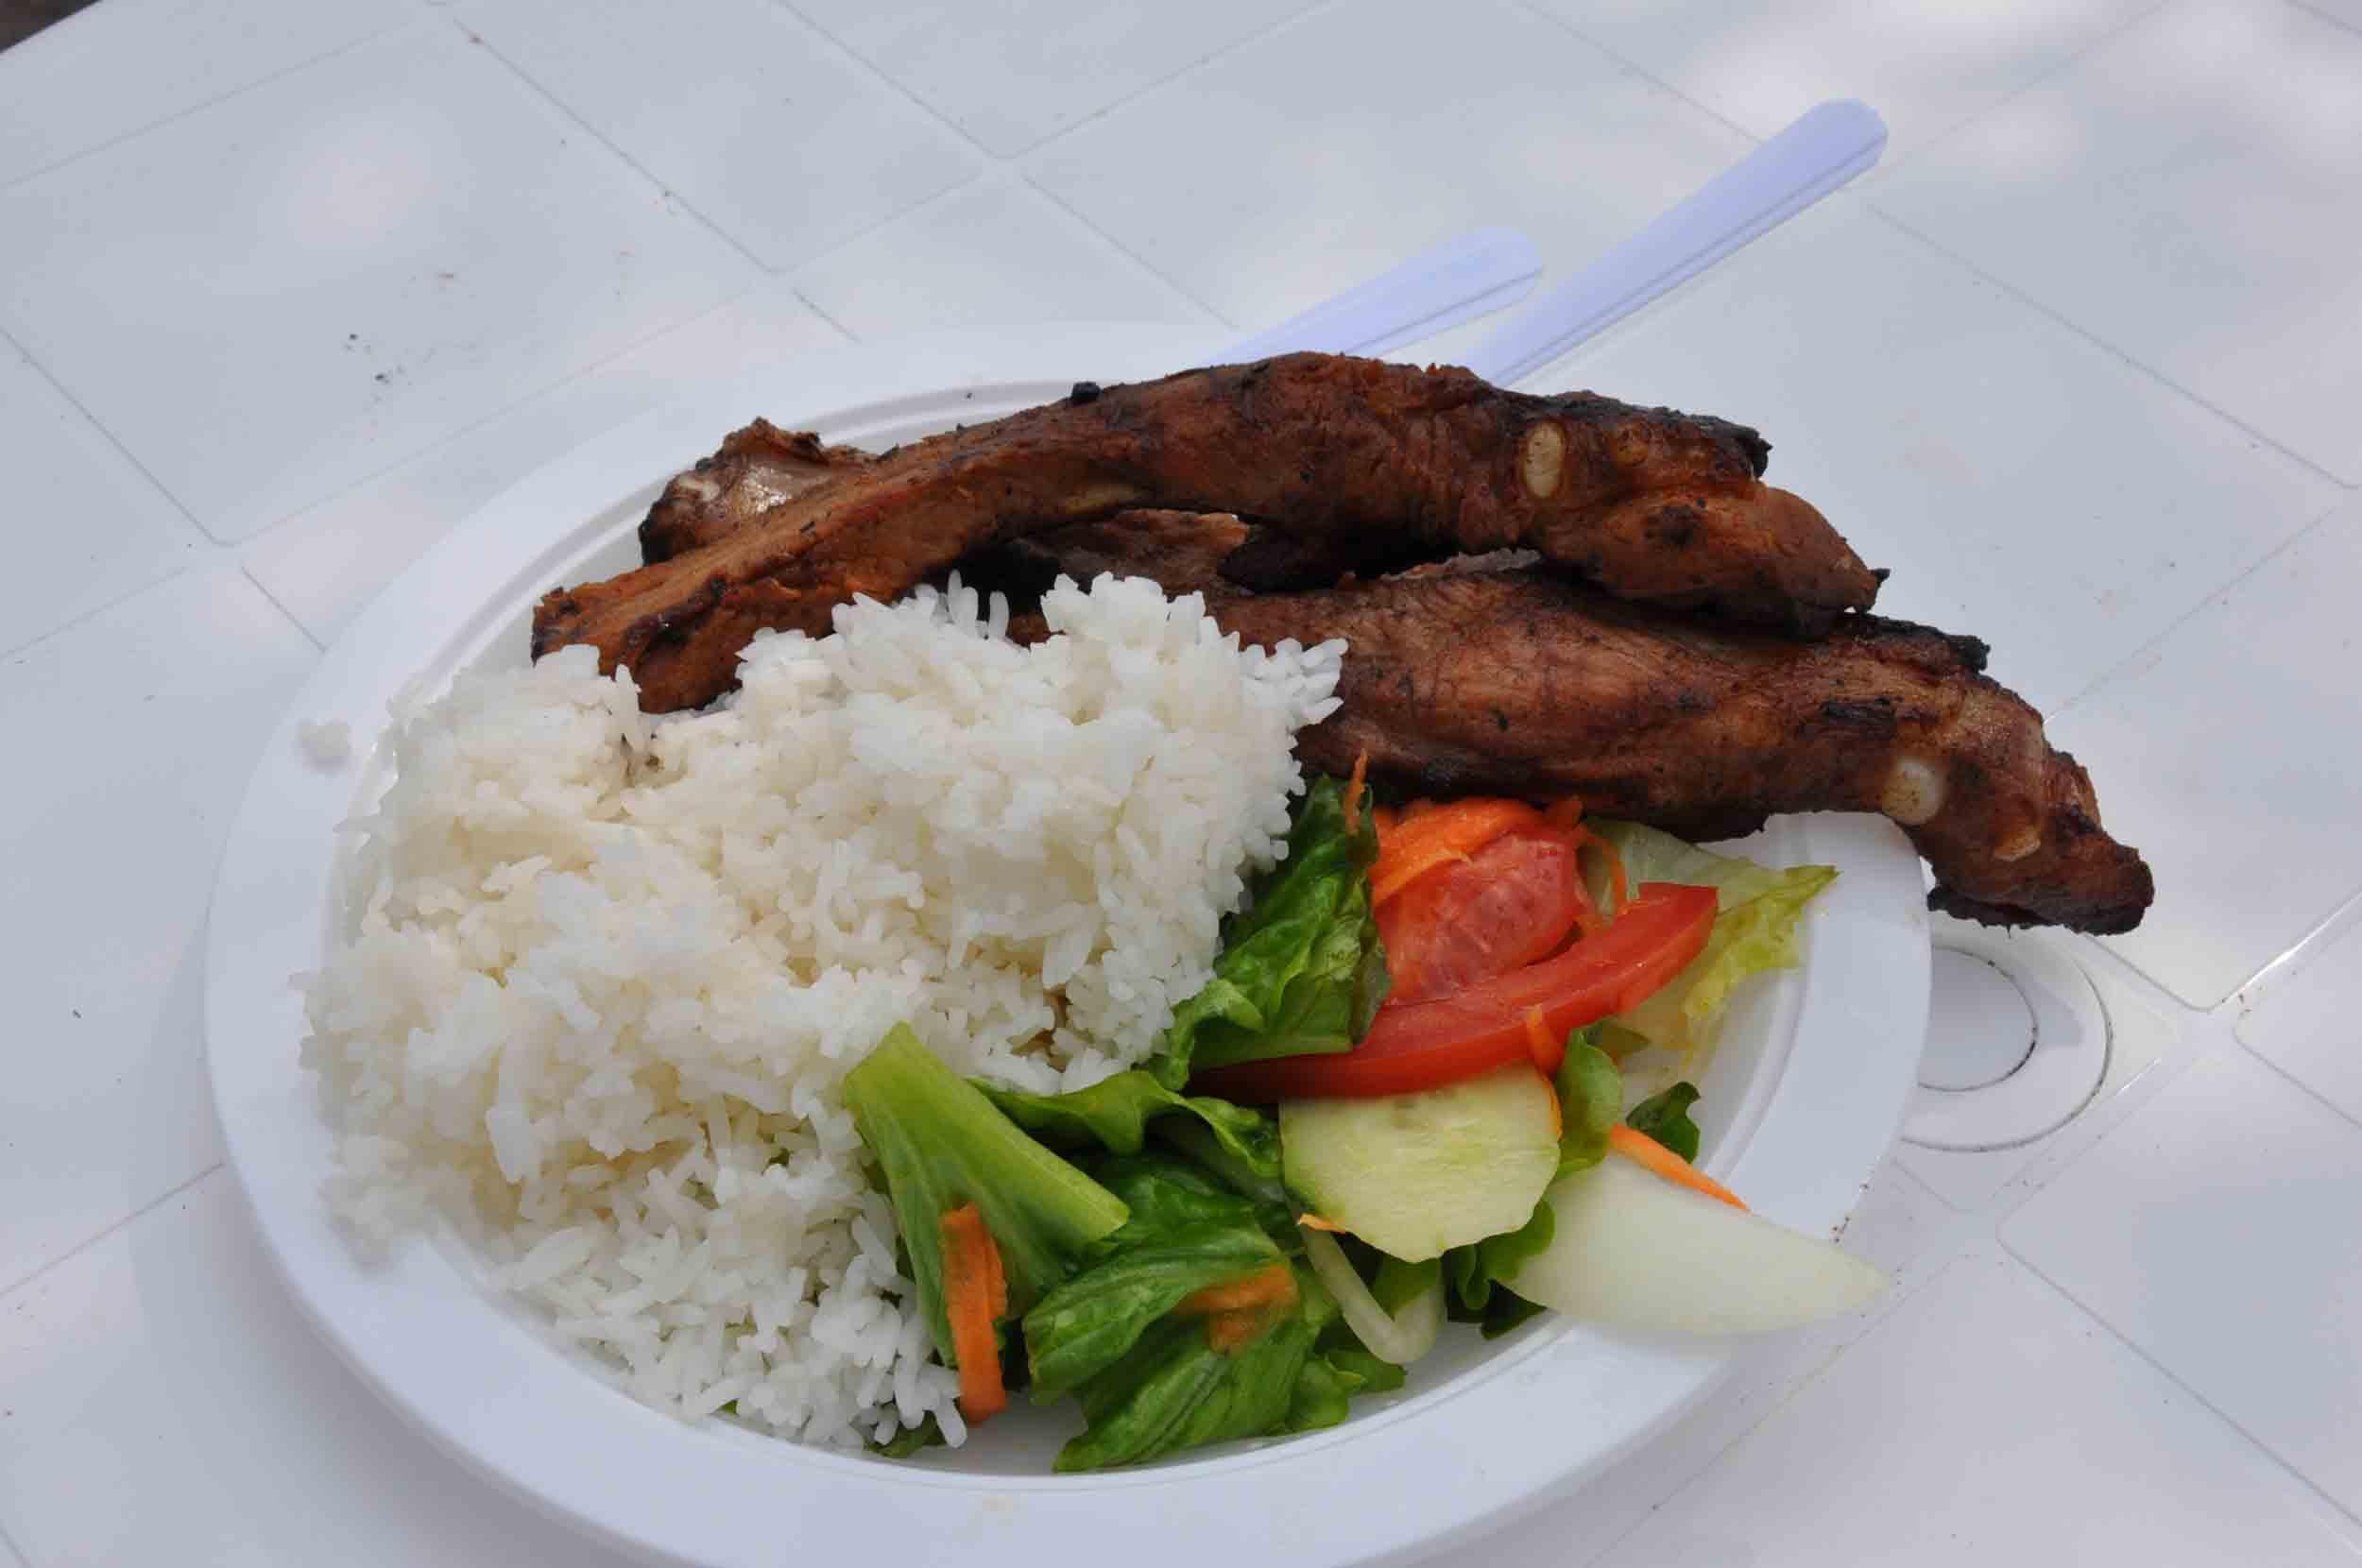 Lusofonia Festival Barbecue Pork Leg